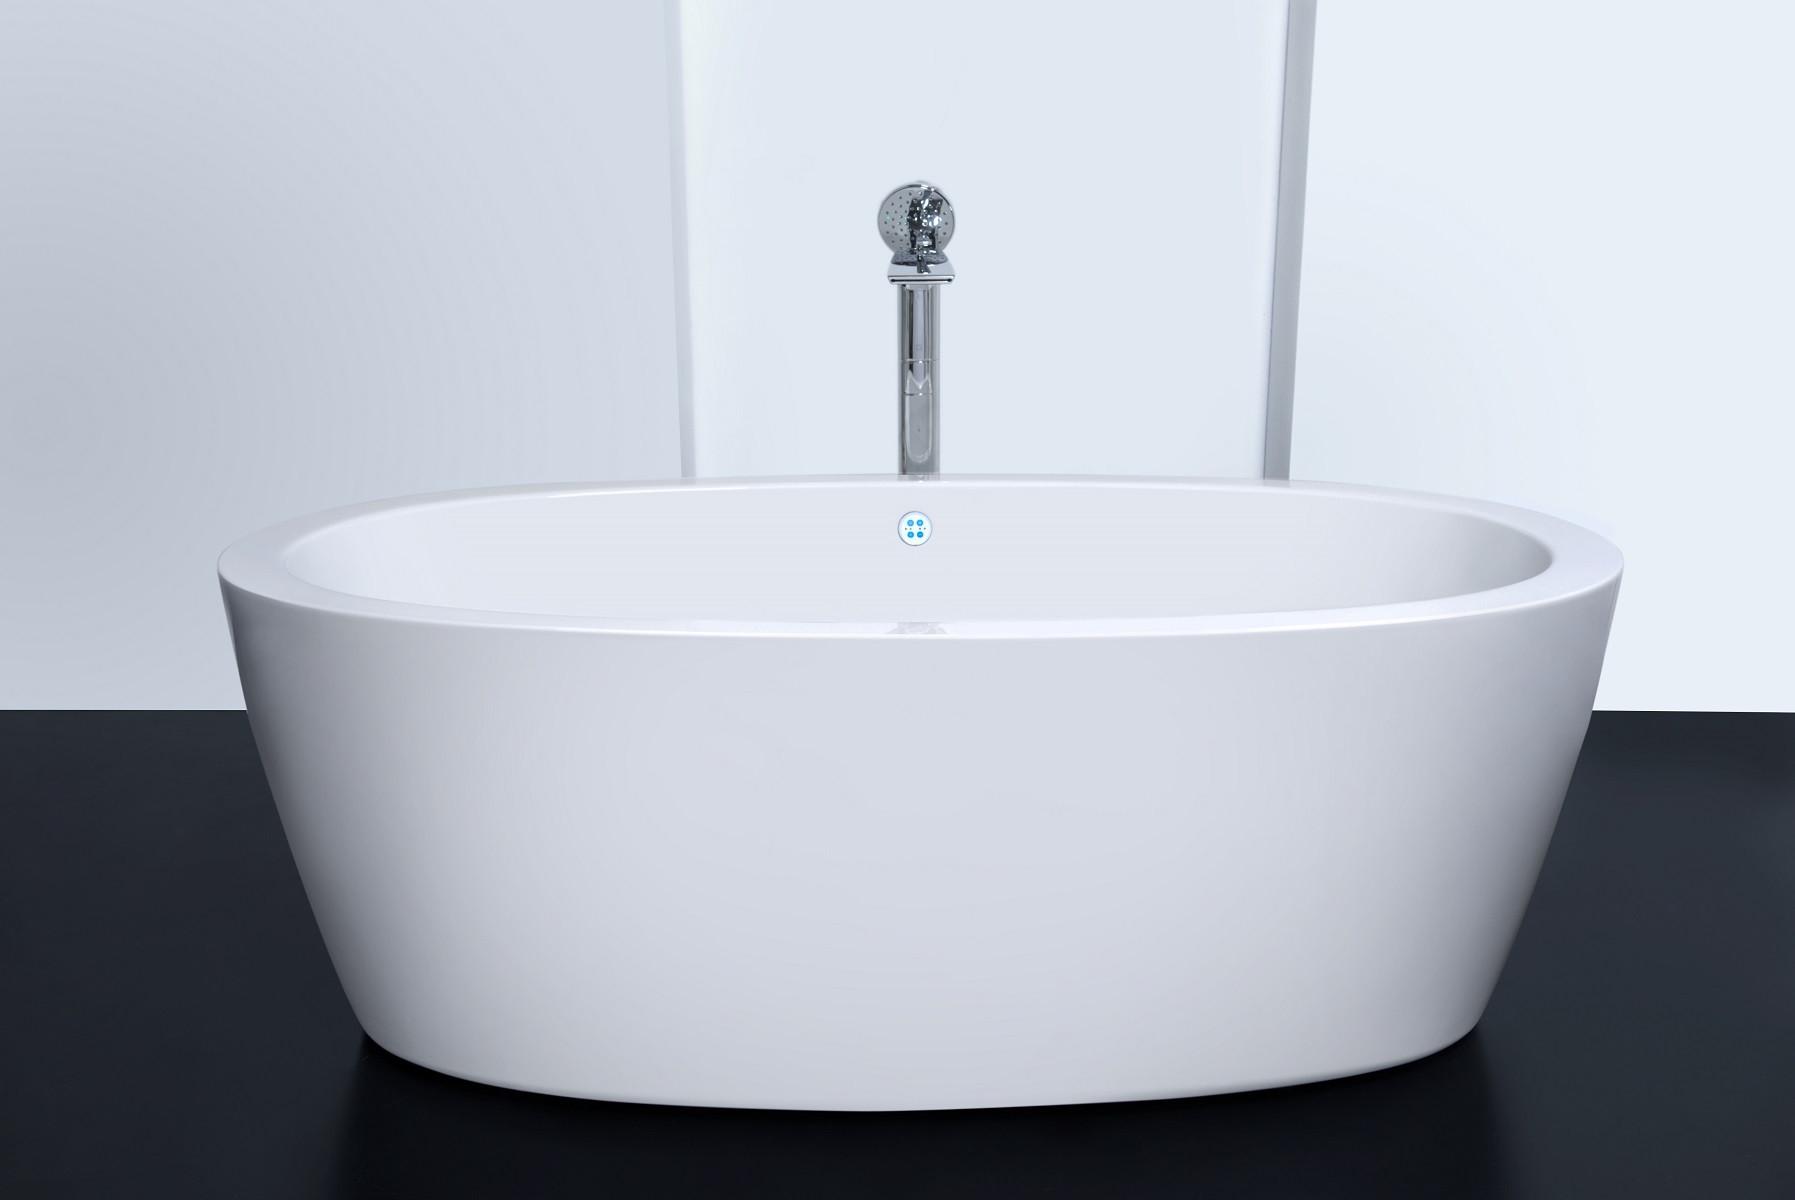 Aquatica PS174A-Wht-Rlx Free Standing Relax Air Massage Bathtub In White